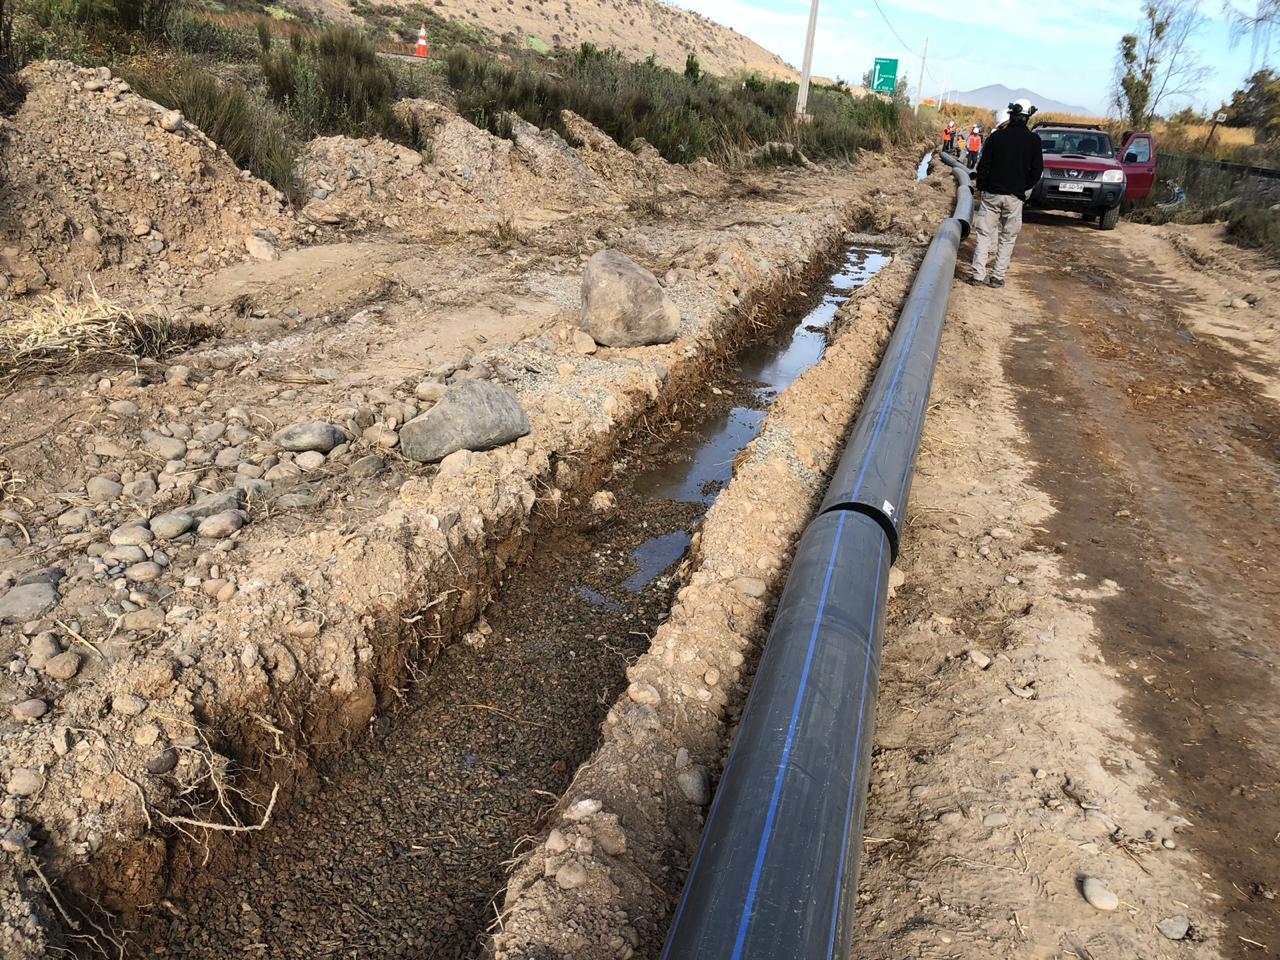 Aguas Chañar comienza obras renovación en tuberías que va de Vallenar hasta Huasco